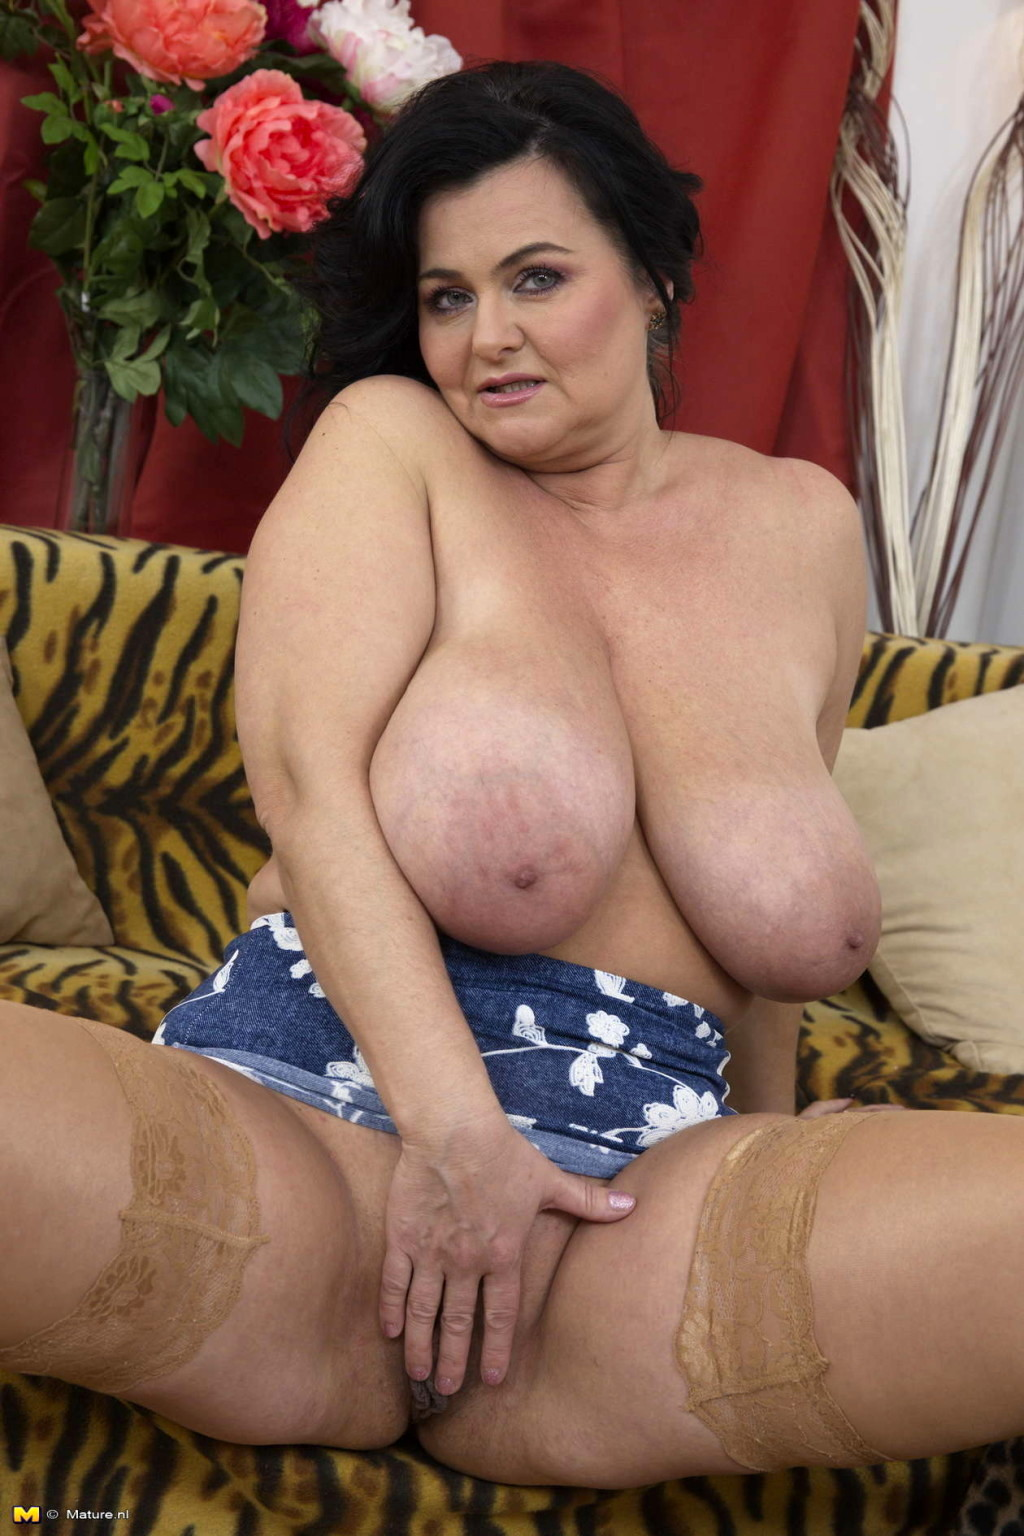 Babe Today Mature Nl Maturenl Model Greatest Big Tits Free -9639